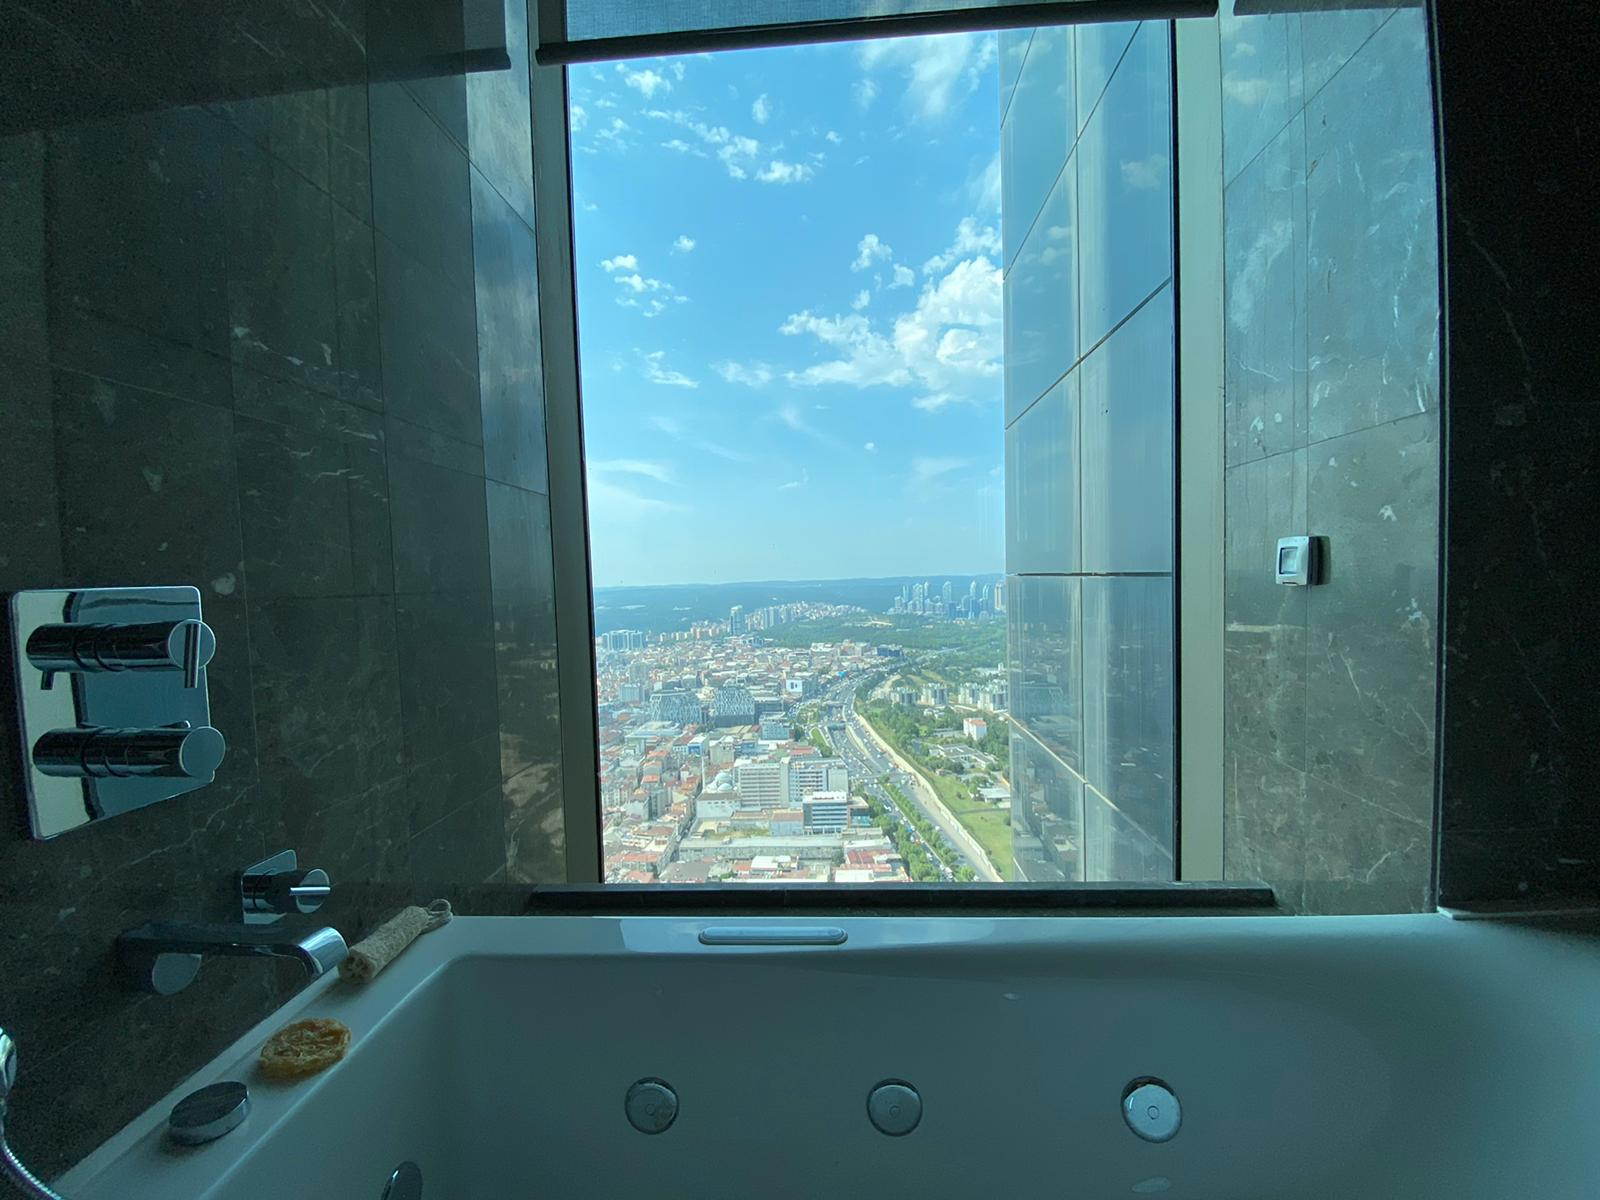 penthouse-istanbul-sapphire-tower-007-1.jpg